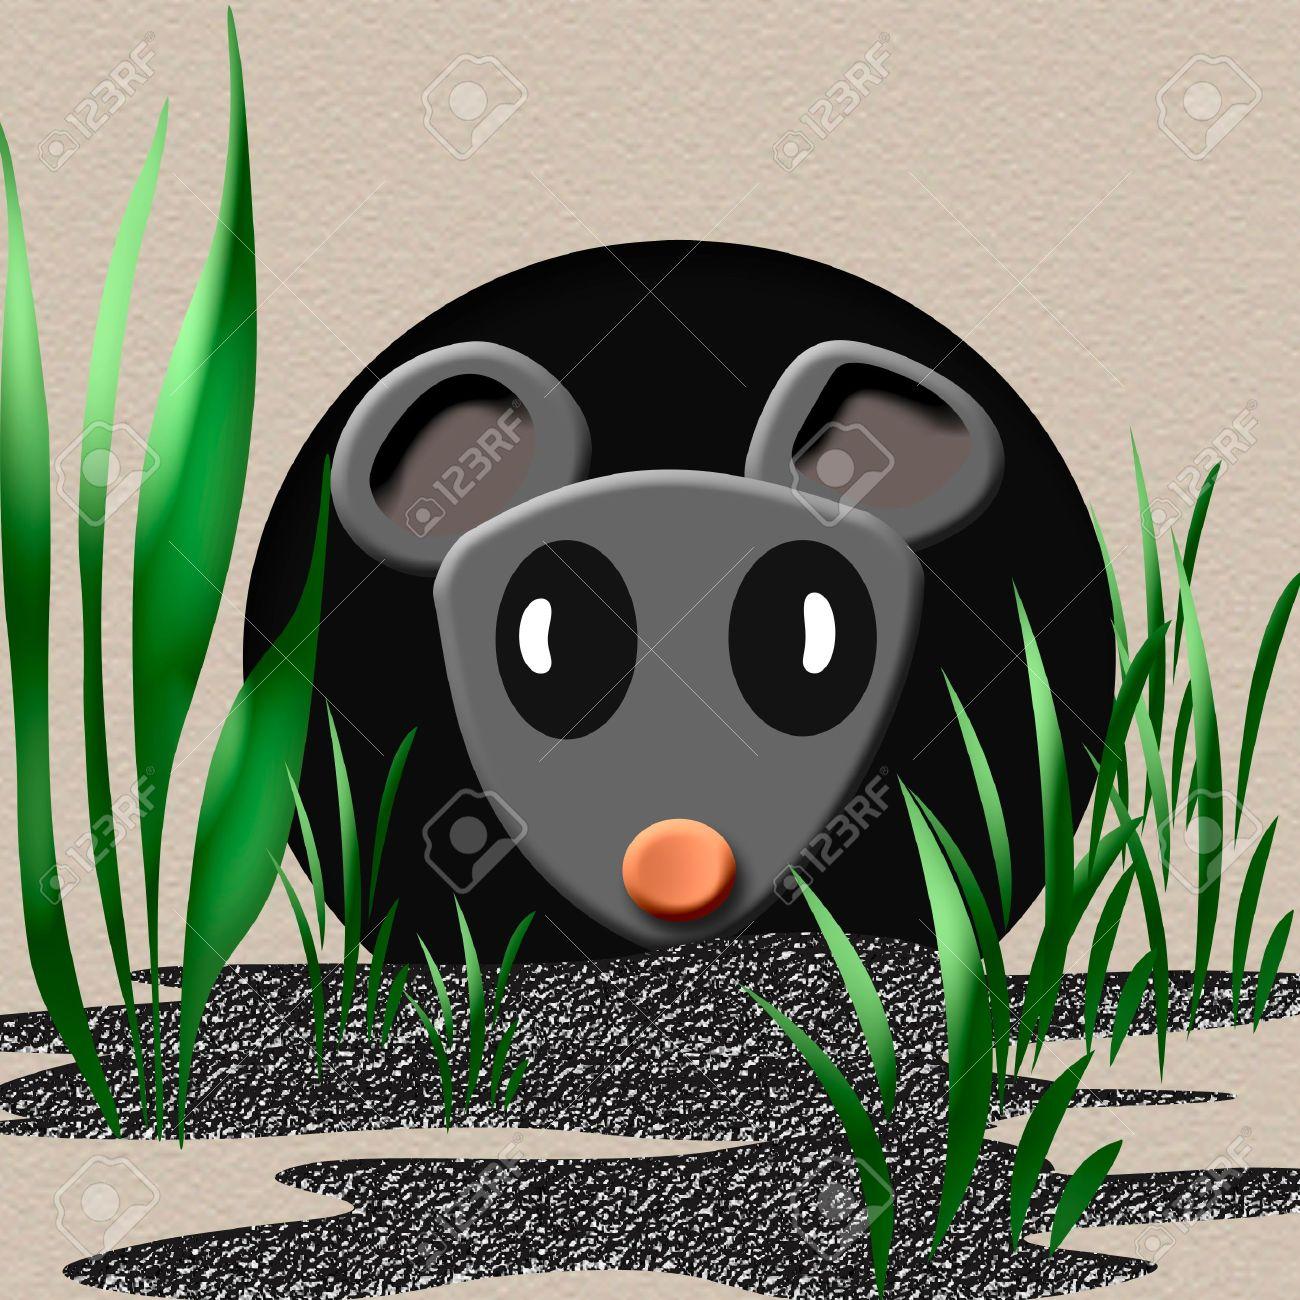 Tiny Gray Mouse Peeking Out Of A Hole Illustration Stock Photo.